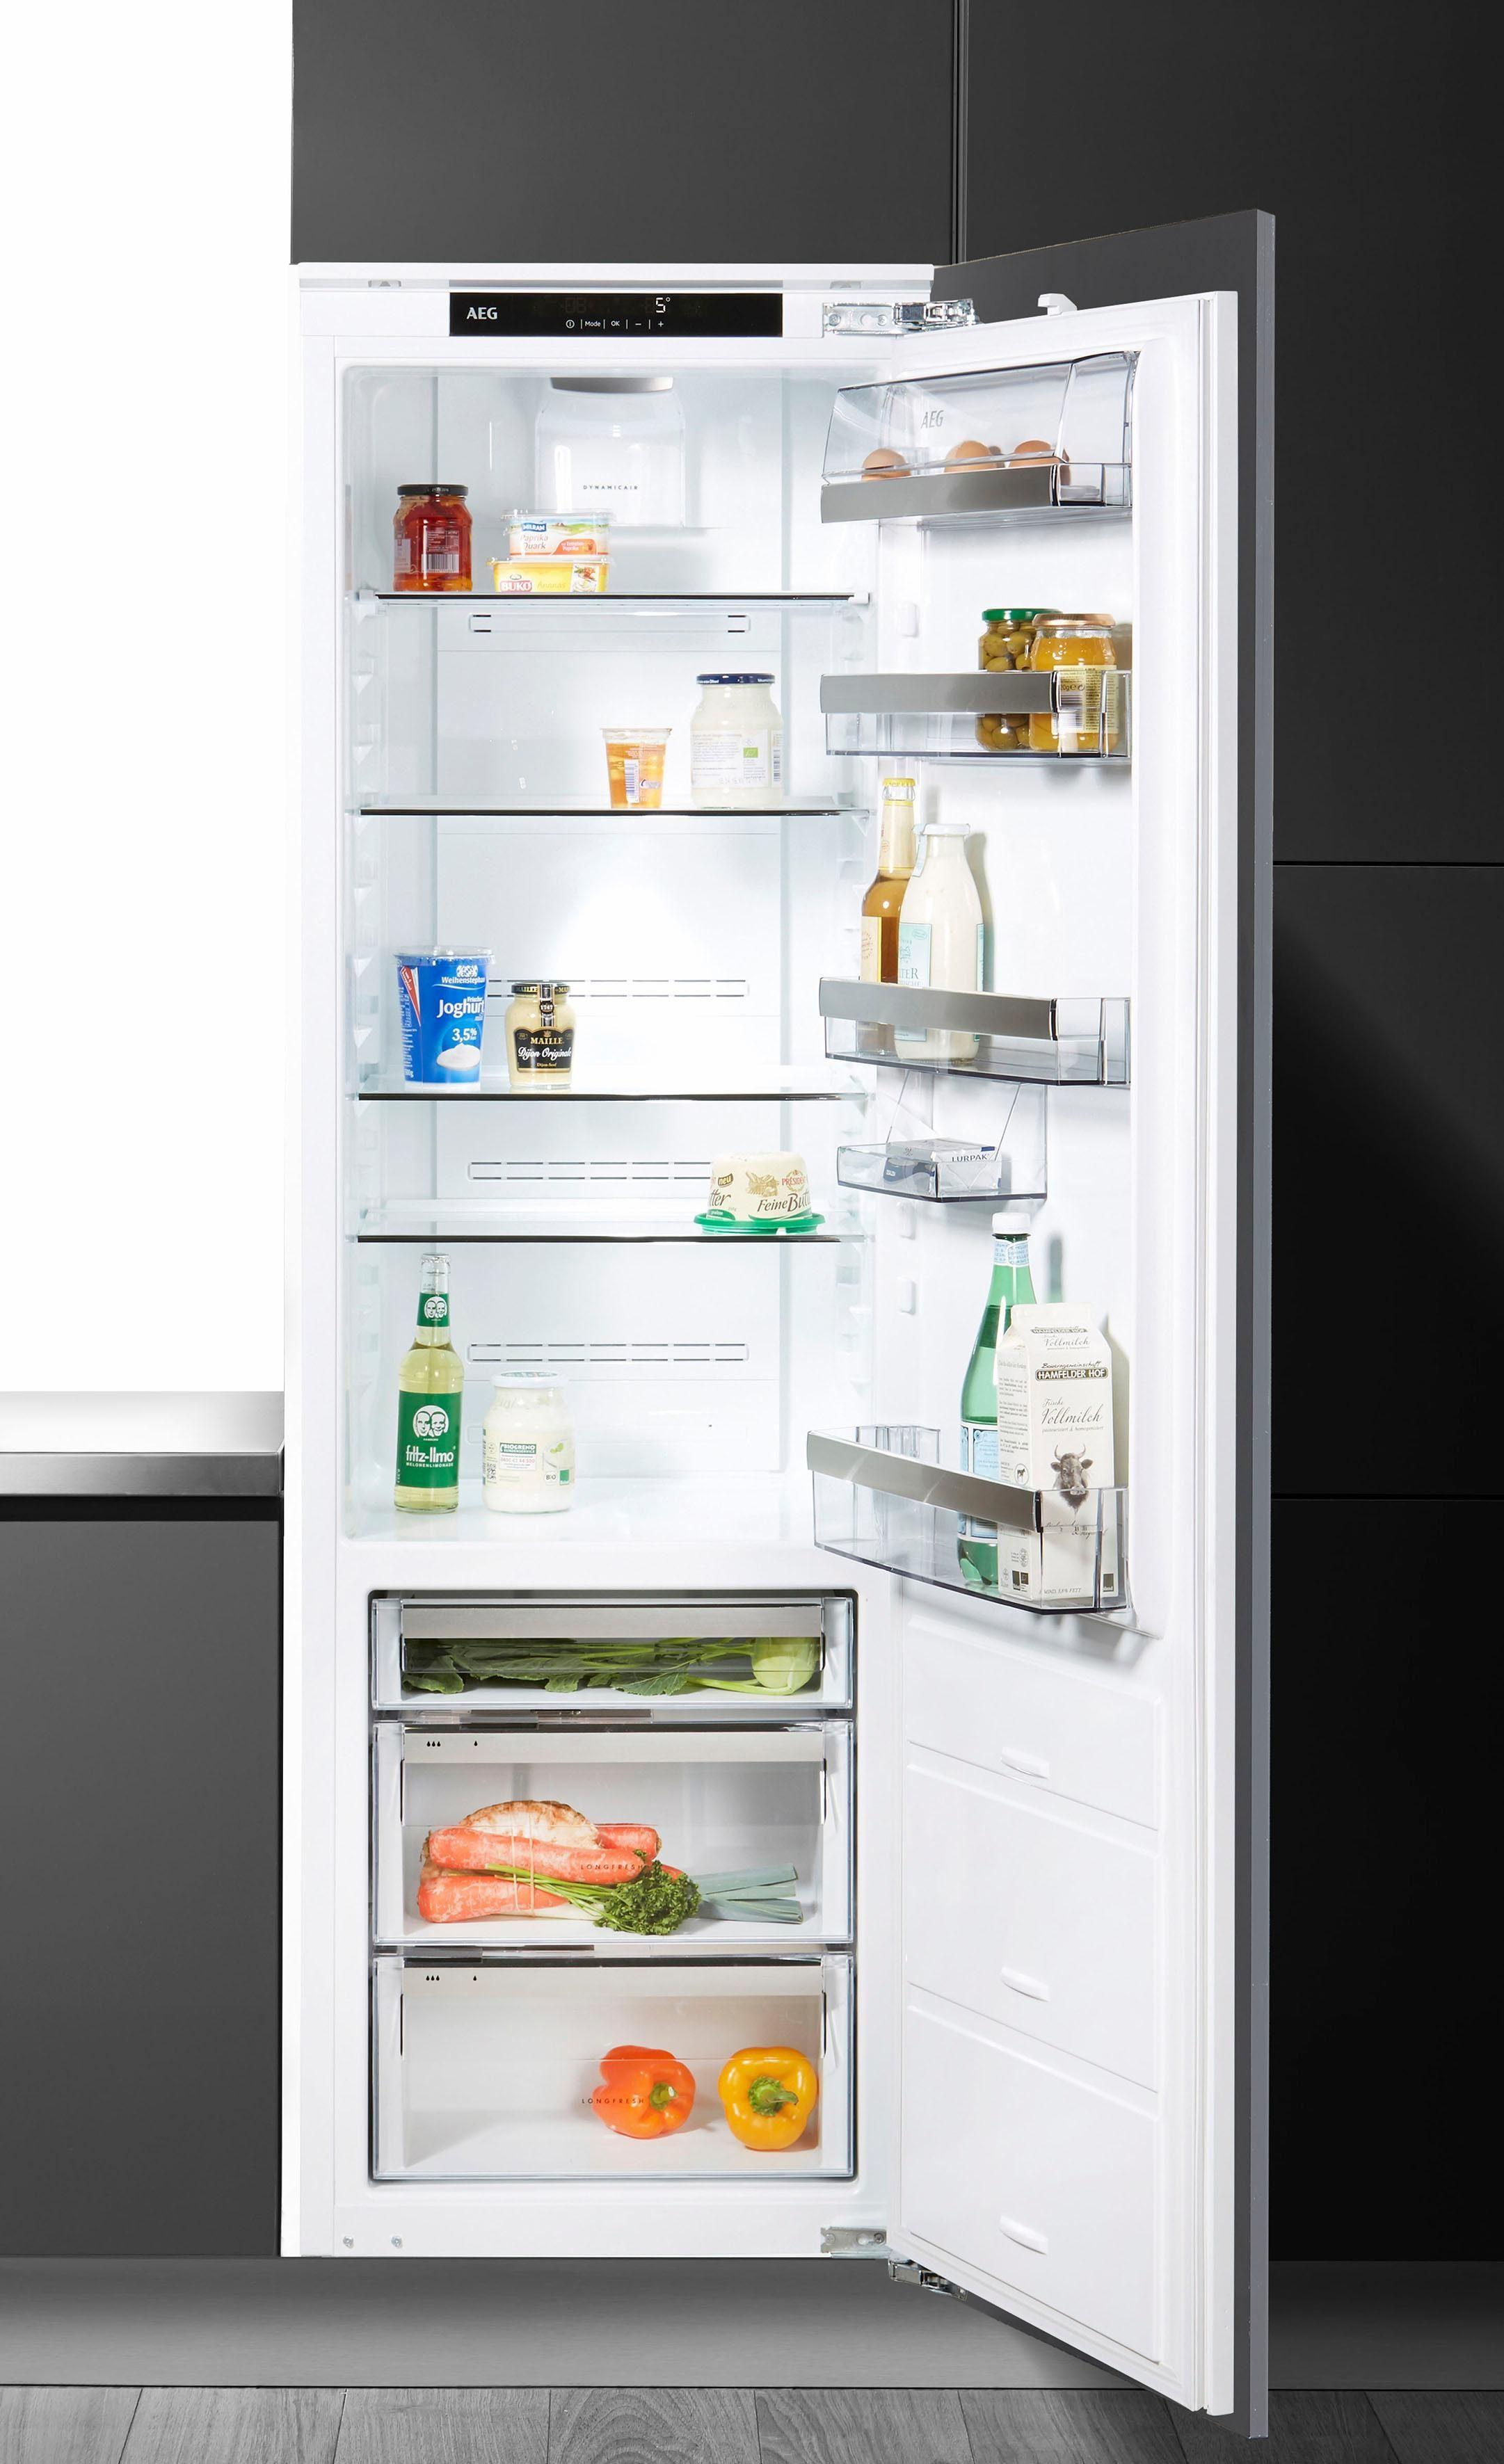 AEG integrierbarer Einbau-Kühlschrank SANTO SKE81826ZC, A++, 178 cm hoch